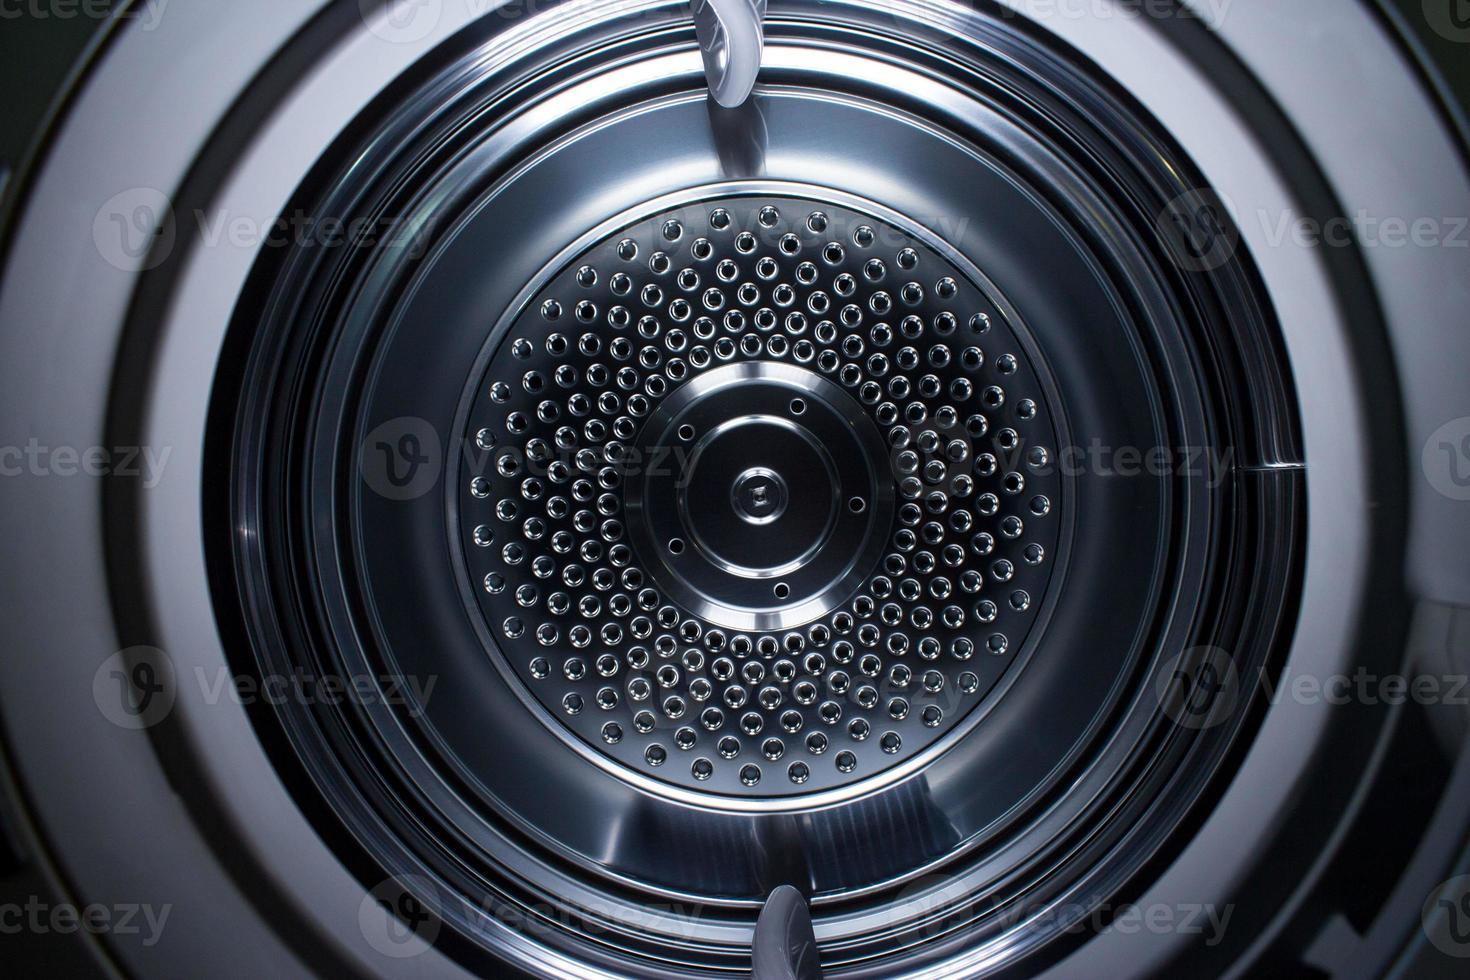 all'interno di una macchina asciugatrice. foto